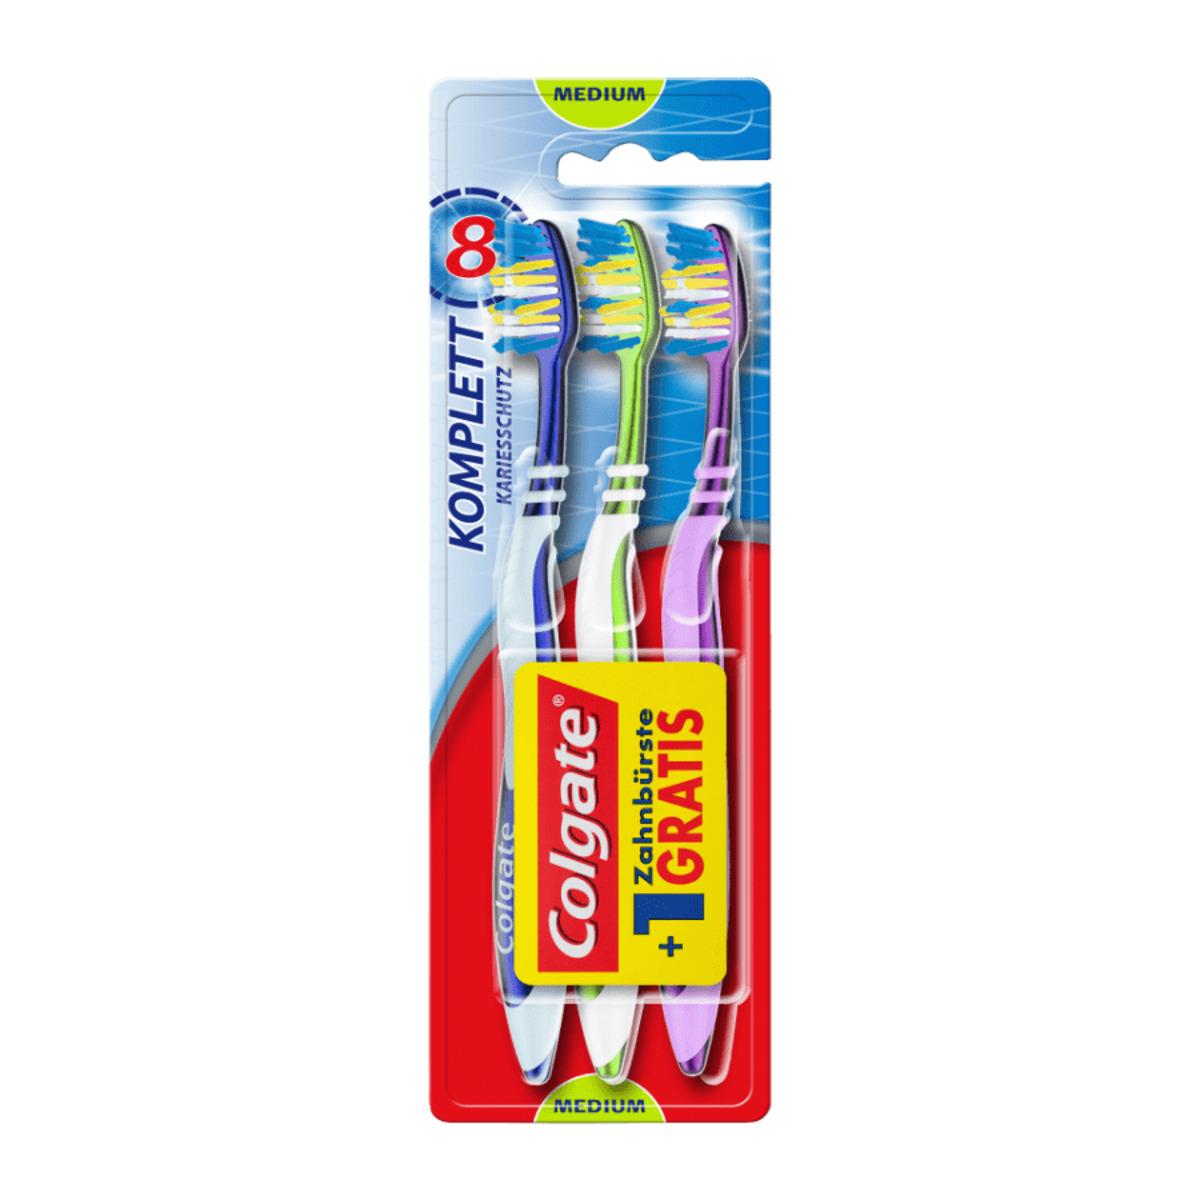 Bild 1 von Colgate Komplett Zahnbürsten